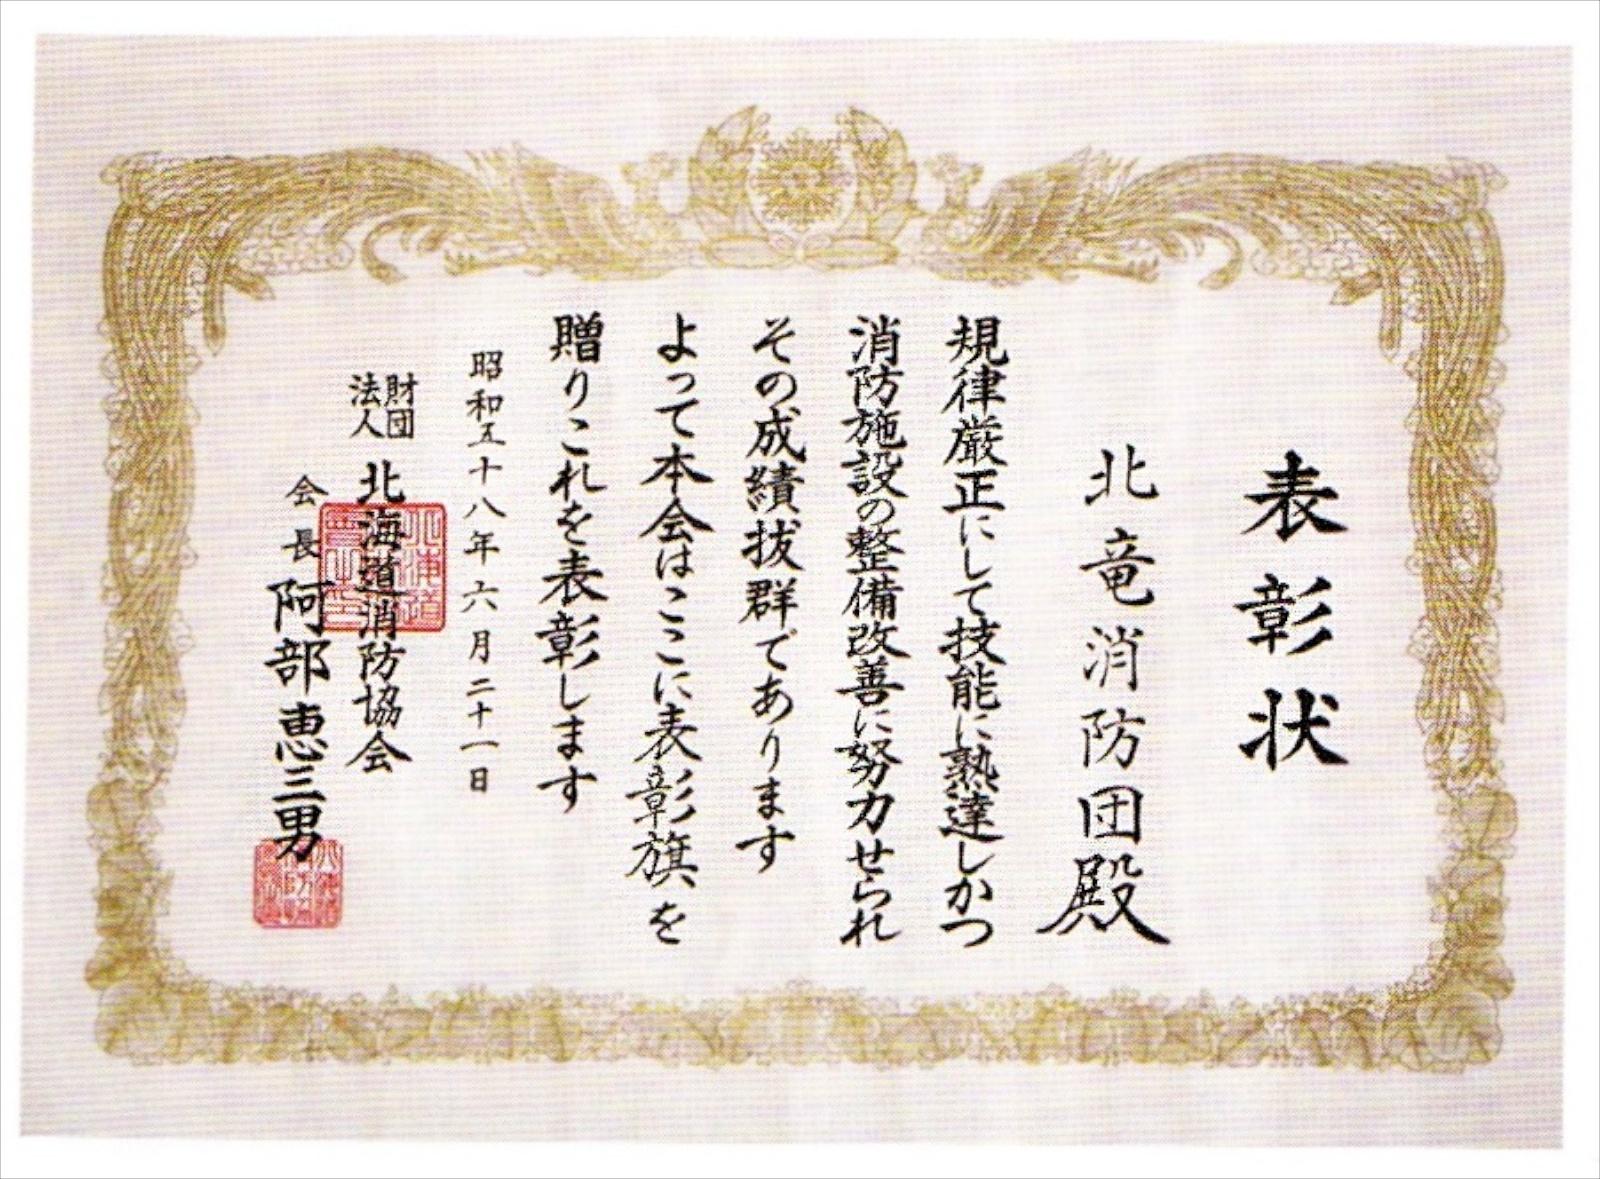 Photo: 優良消防団表彰 昭和58年(1983年) 北海道消防協会長